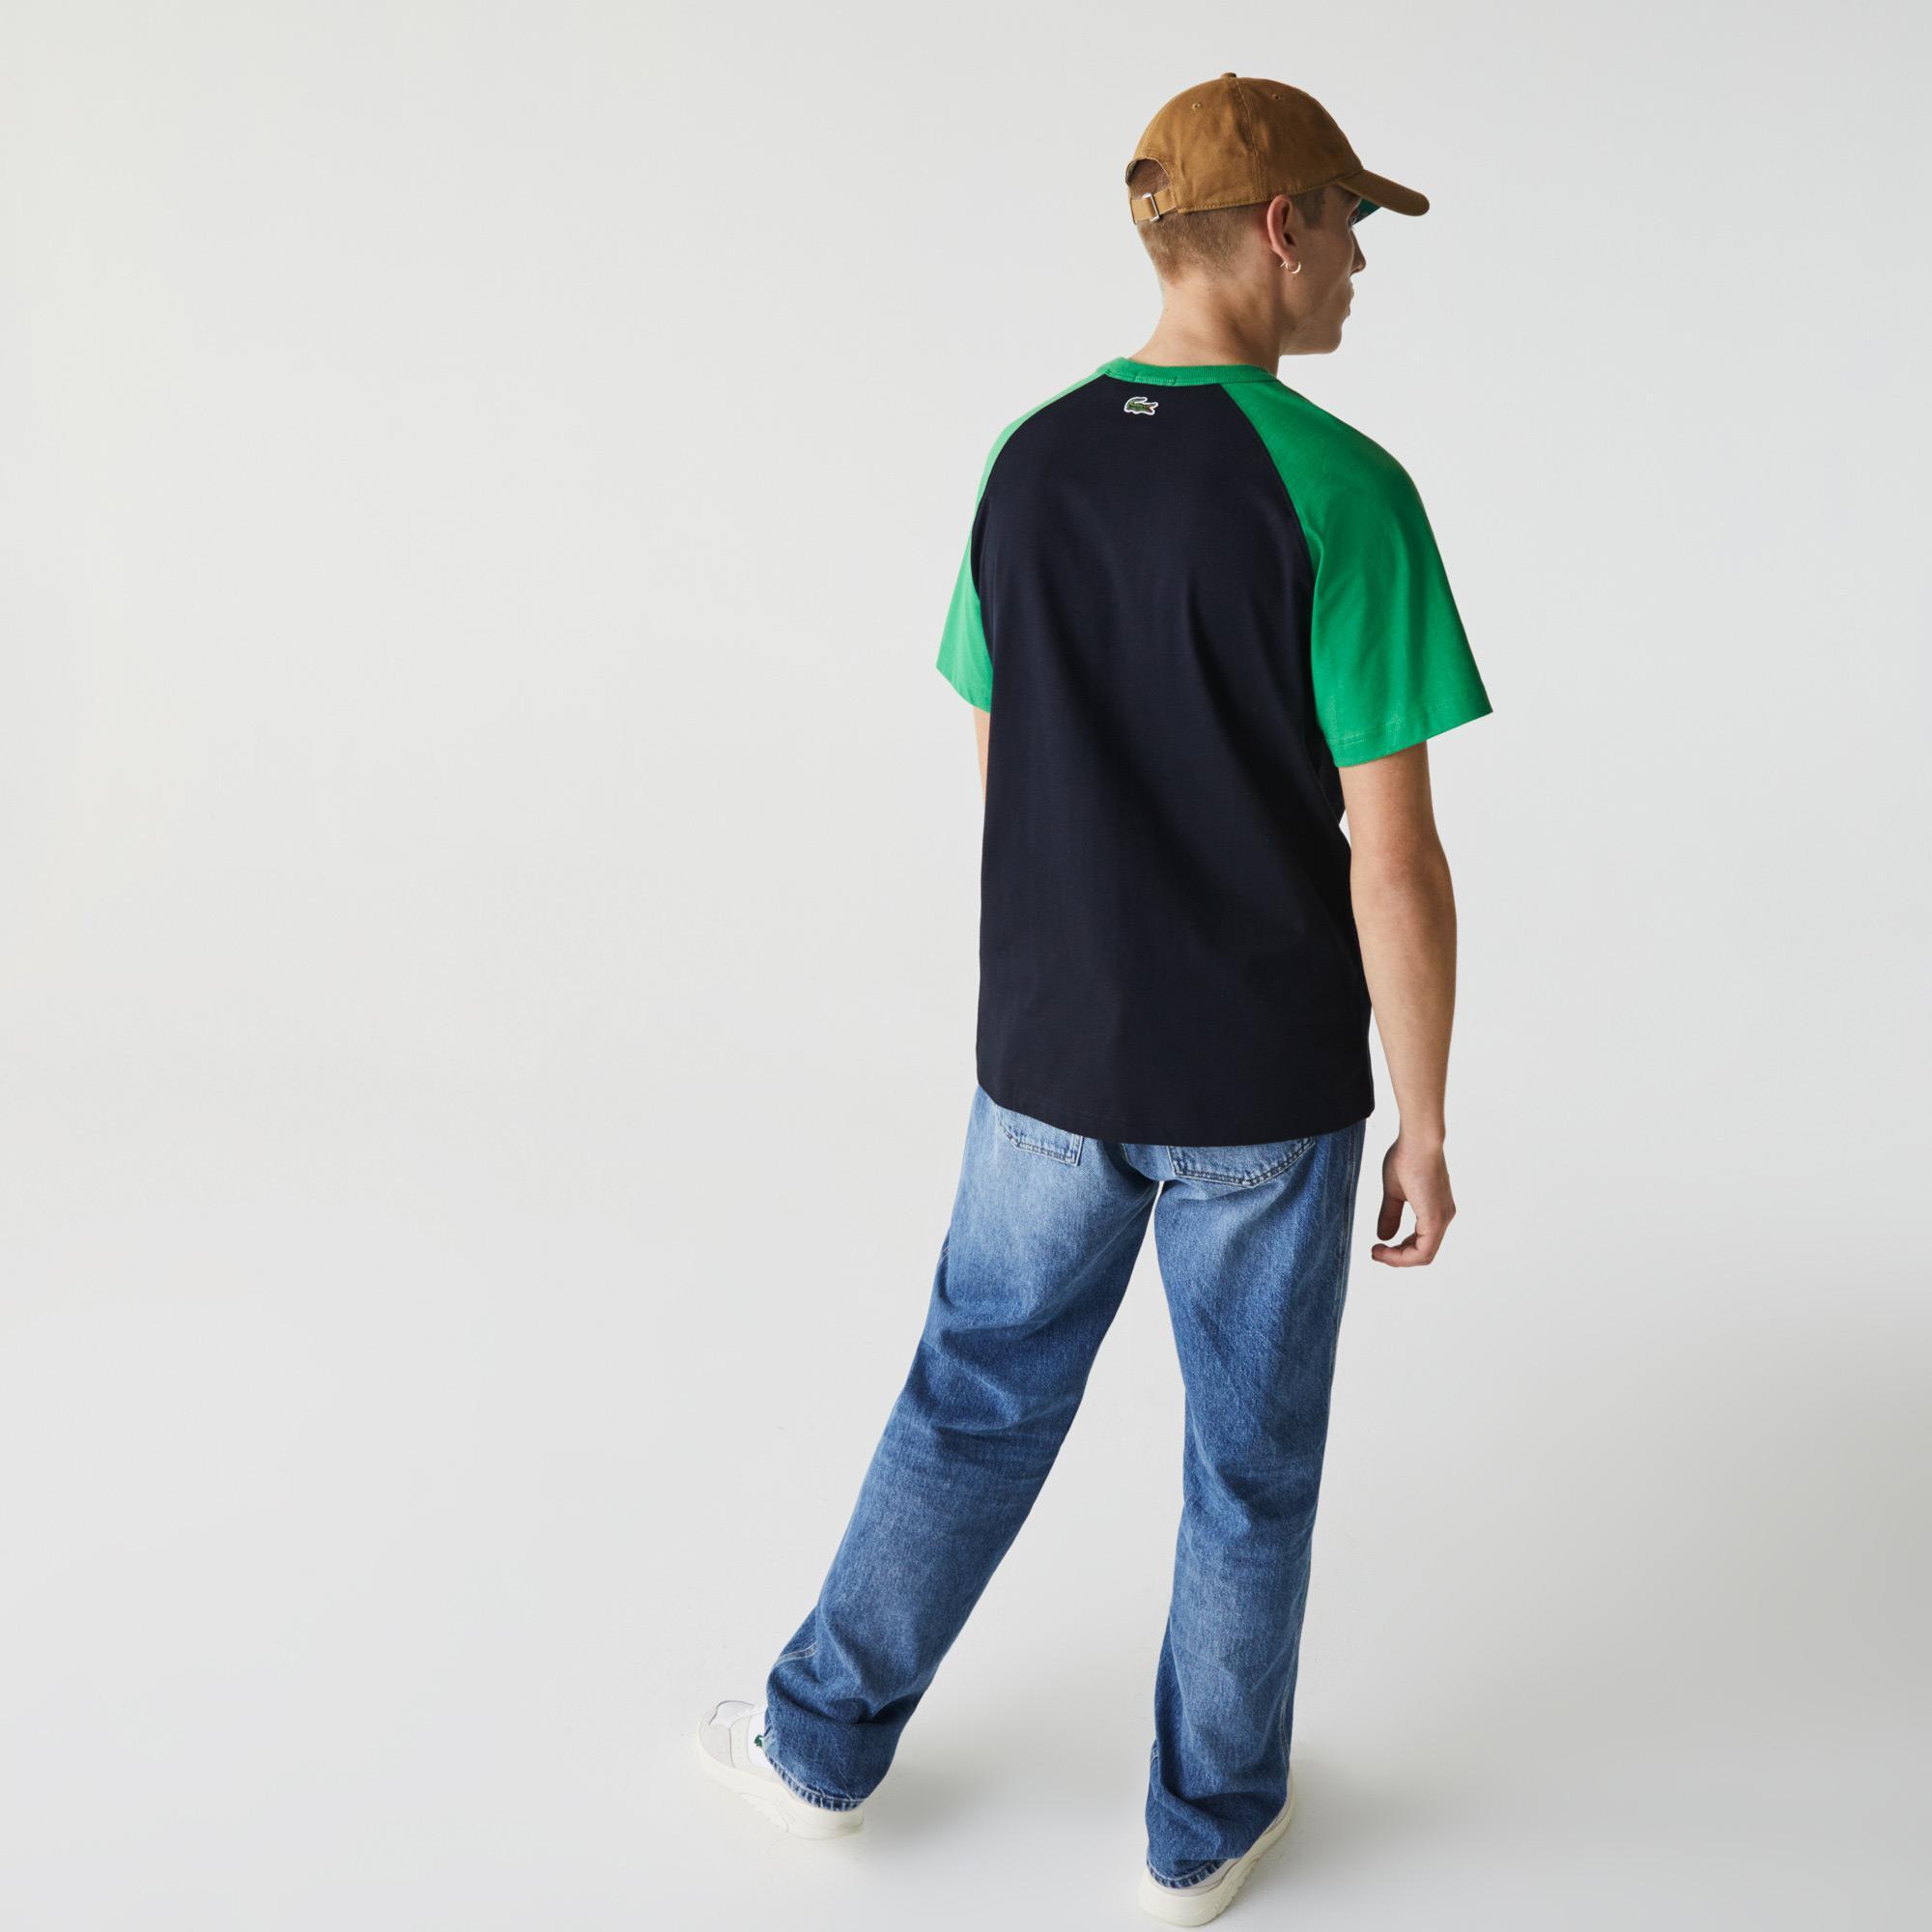 Lacoste L!ve Unisex Bisiklet Yaka Renk Bloklu Yeşil - Lacivert T-Shirt